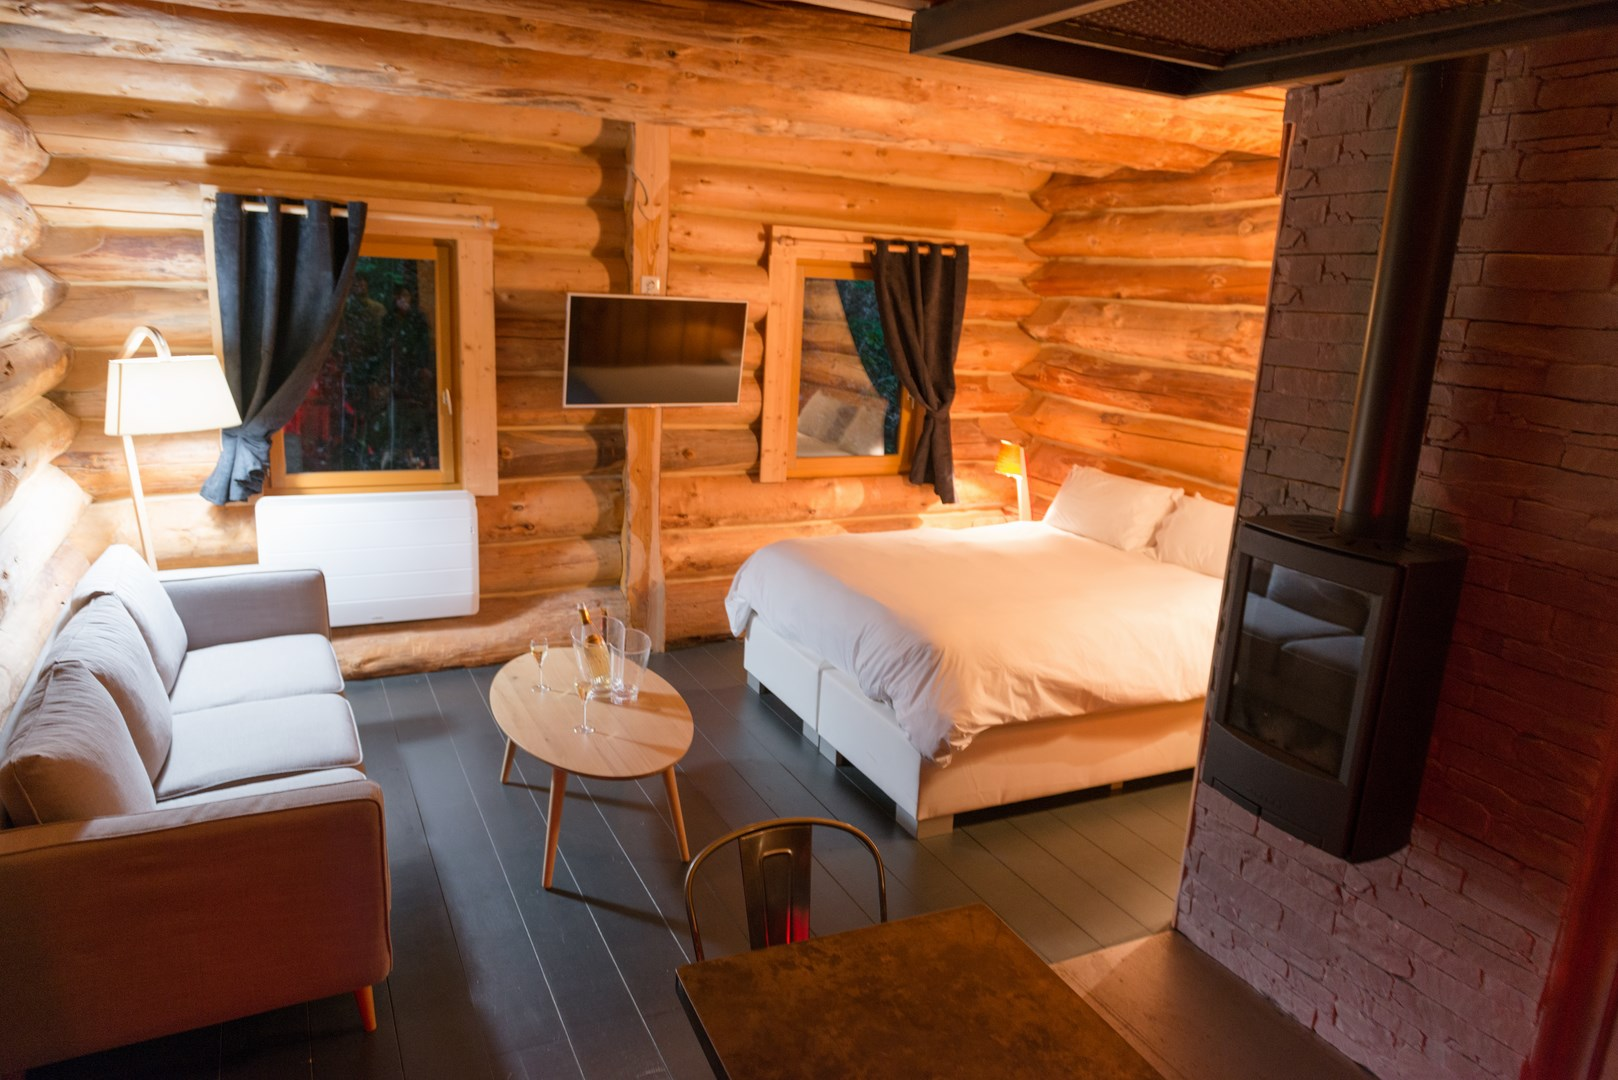 chalet avec spa location de chalets en p rigord. Black Bedroom Furniture Sets. Home Design Ideas